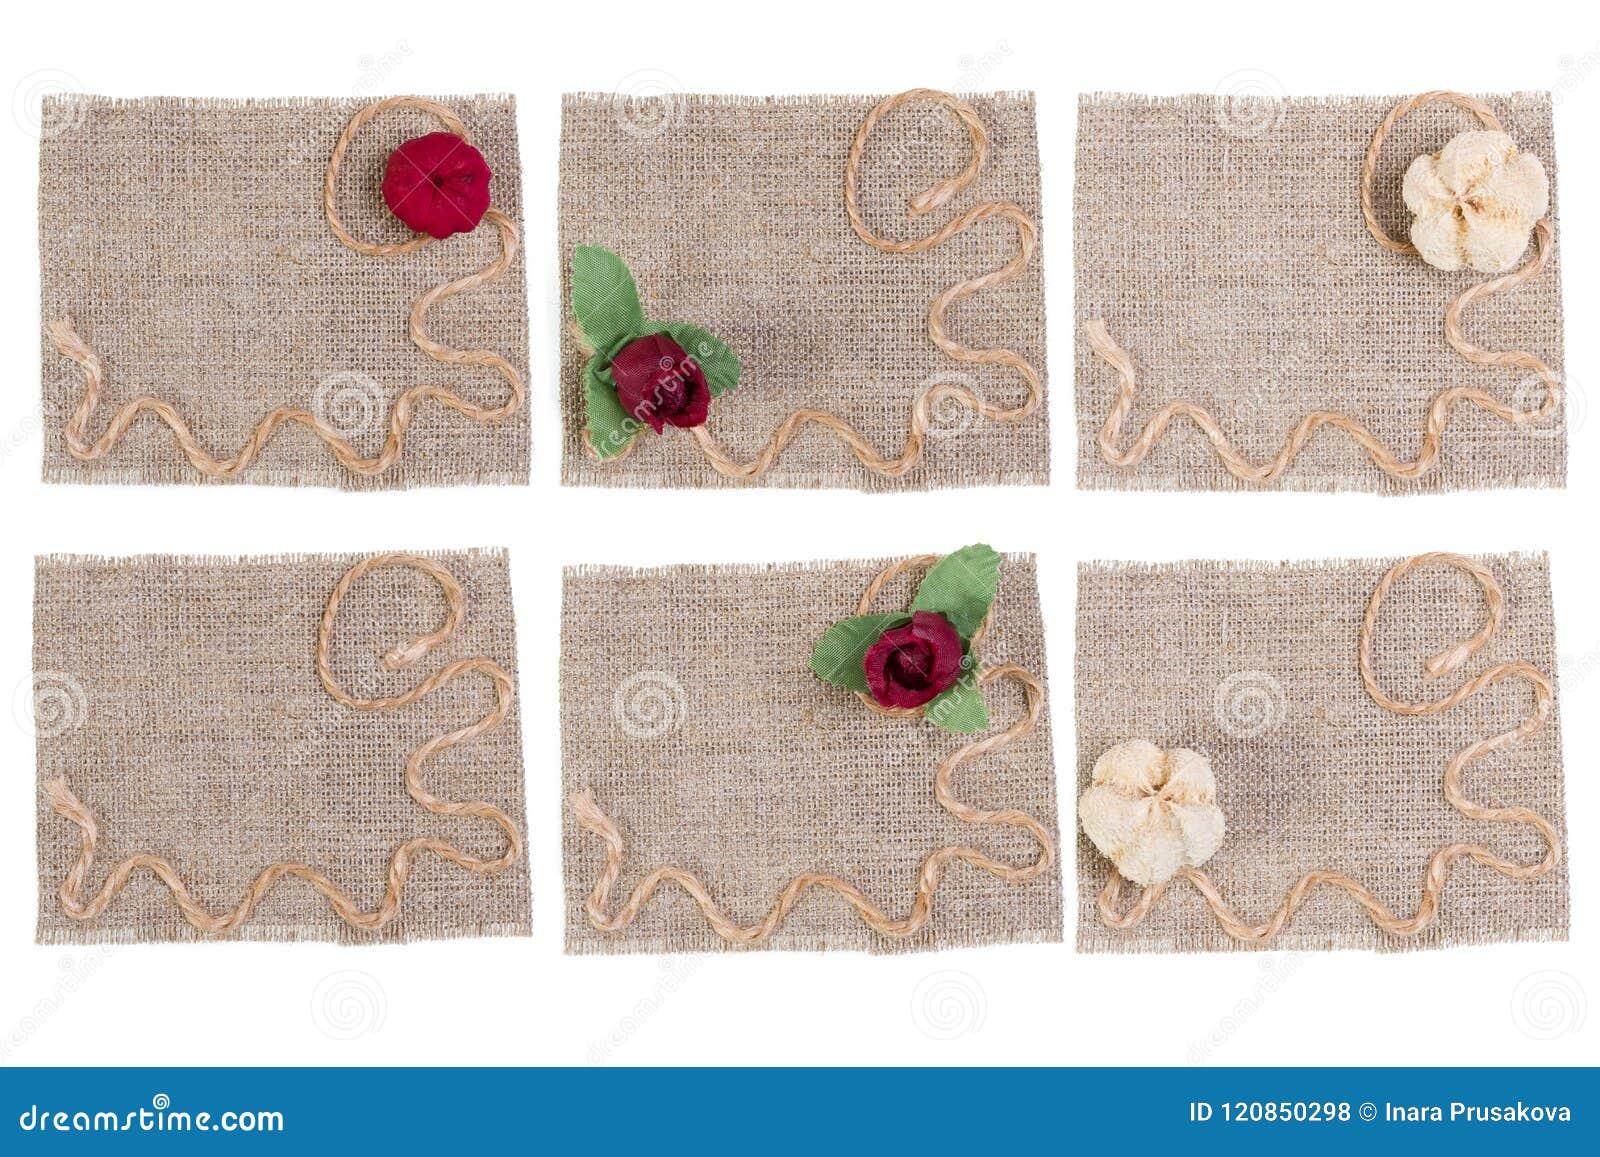 Sackcloth και λουλουδιών διακόσμηση, Burlap σύνολο μπαλωμάτων ετικετών υφάσματος, αγροτικό κομμάτι υφασμάτων σάκων